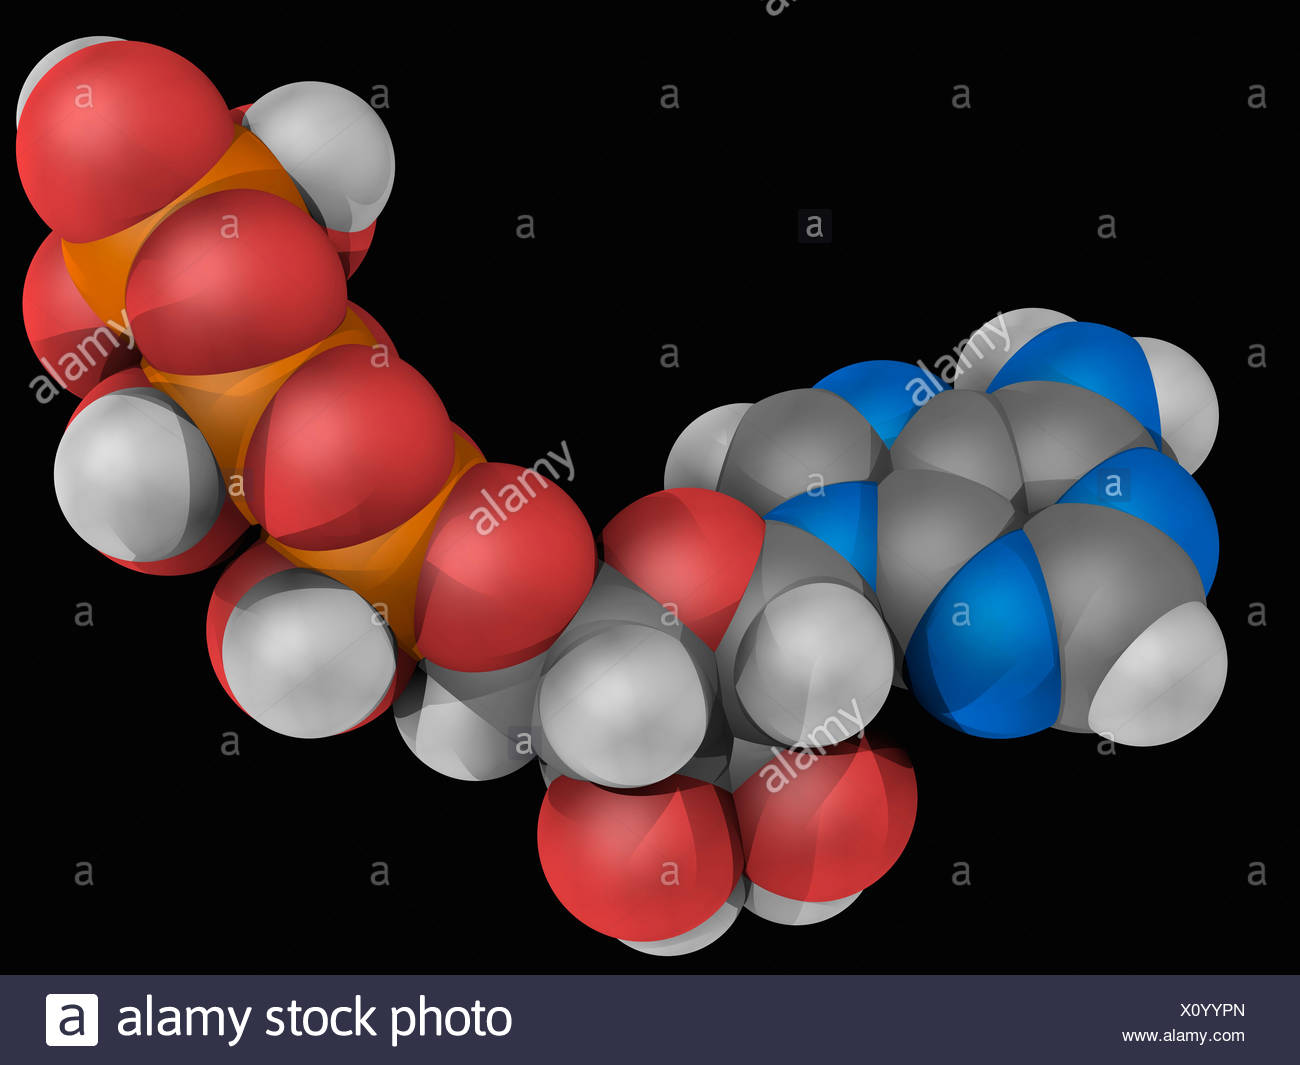 Adenosine triphosphate molecule Stock Photo